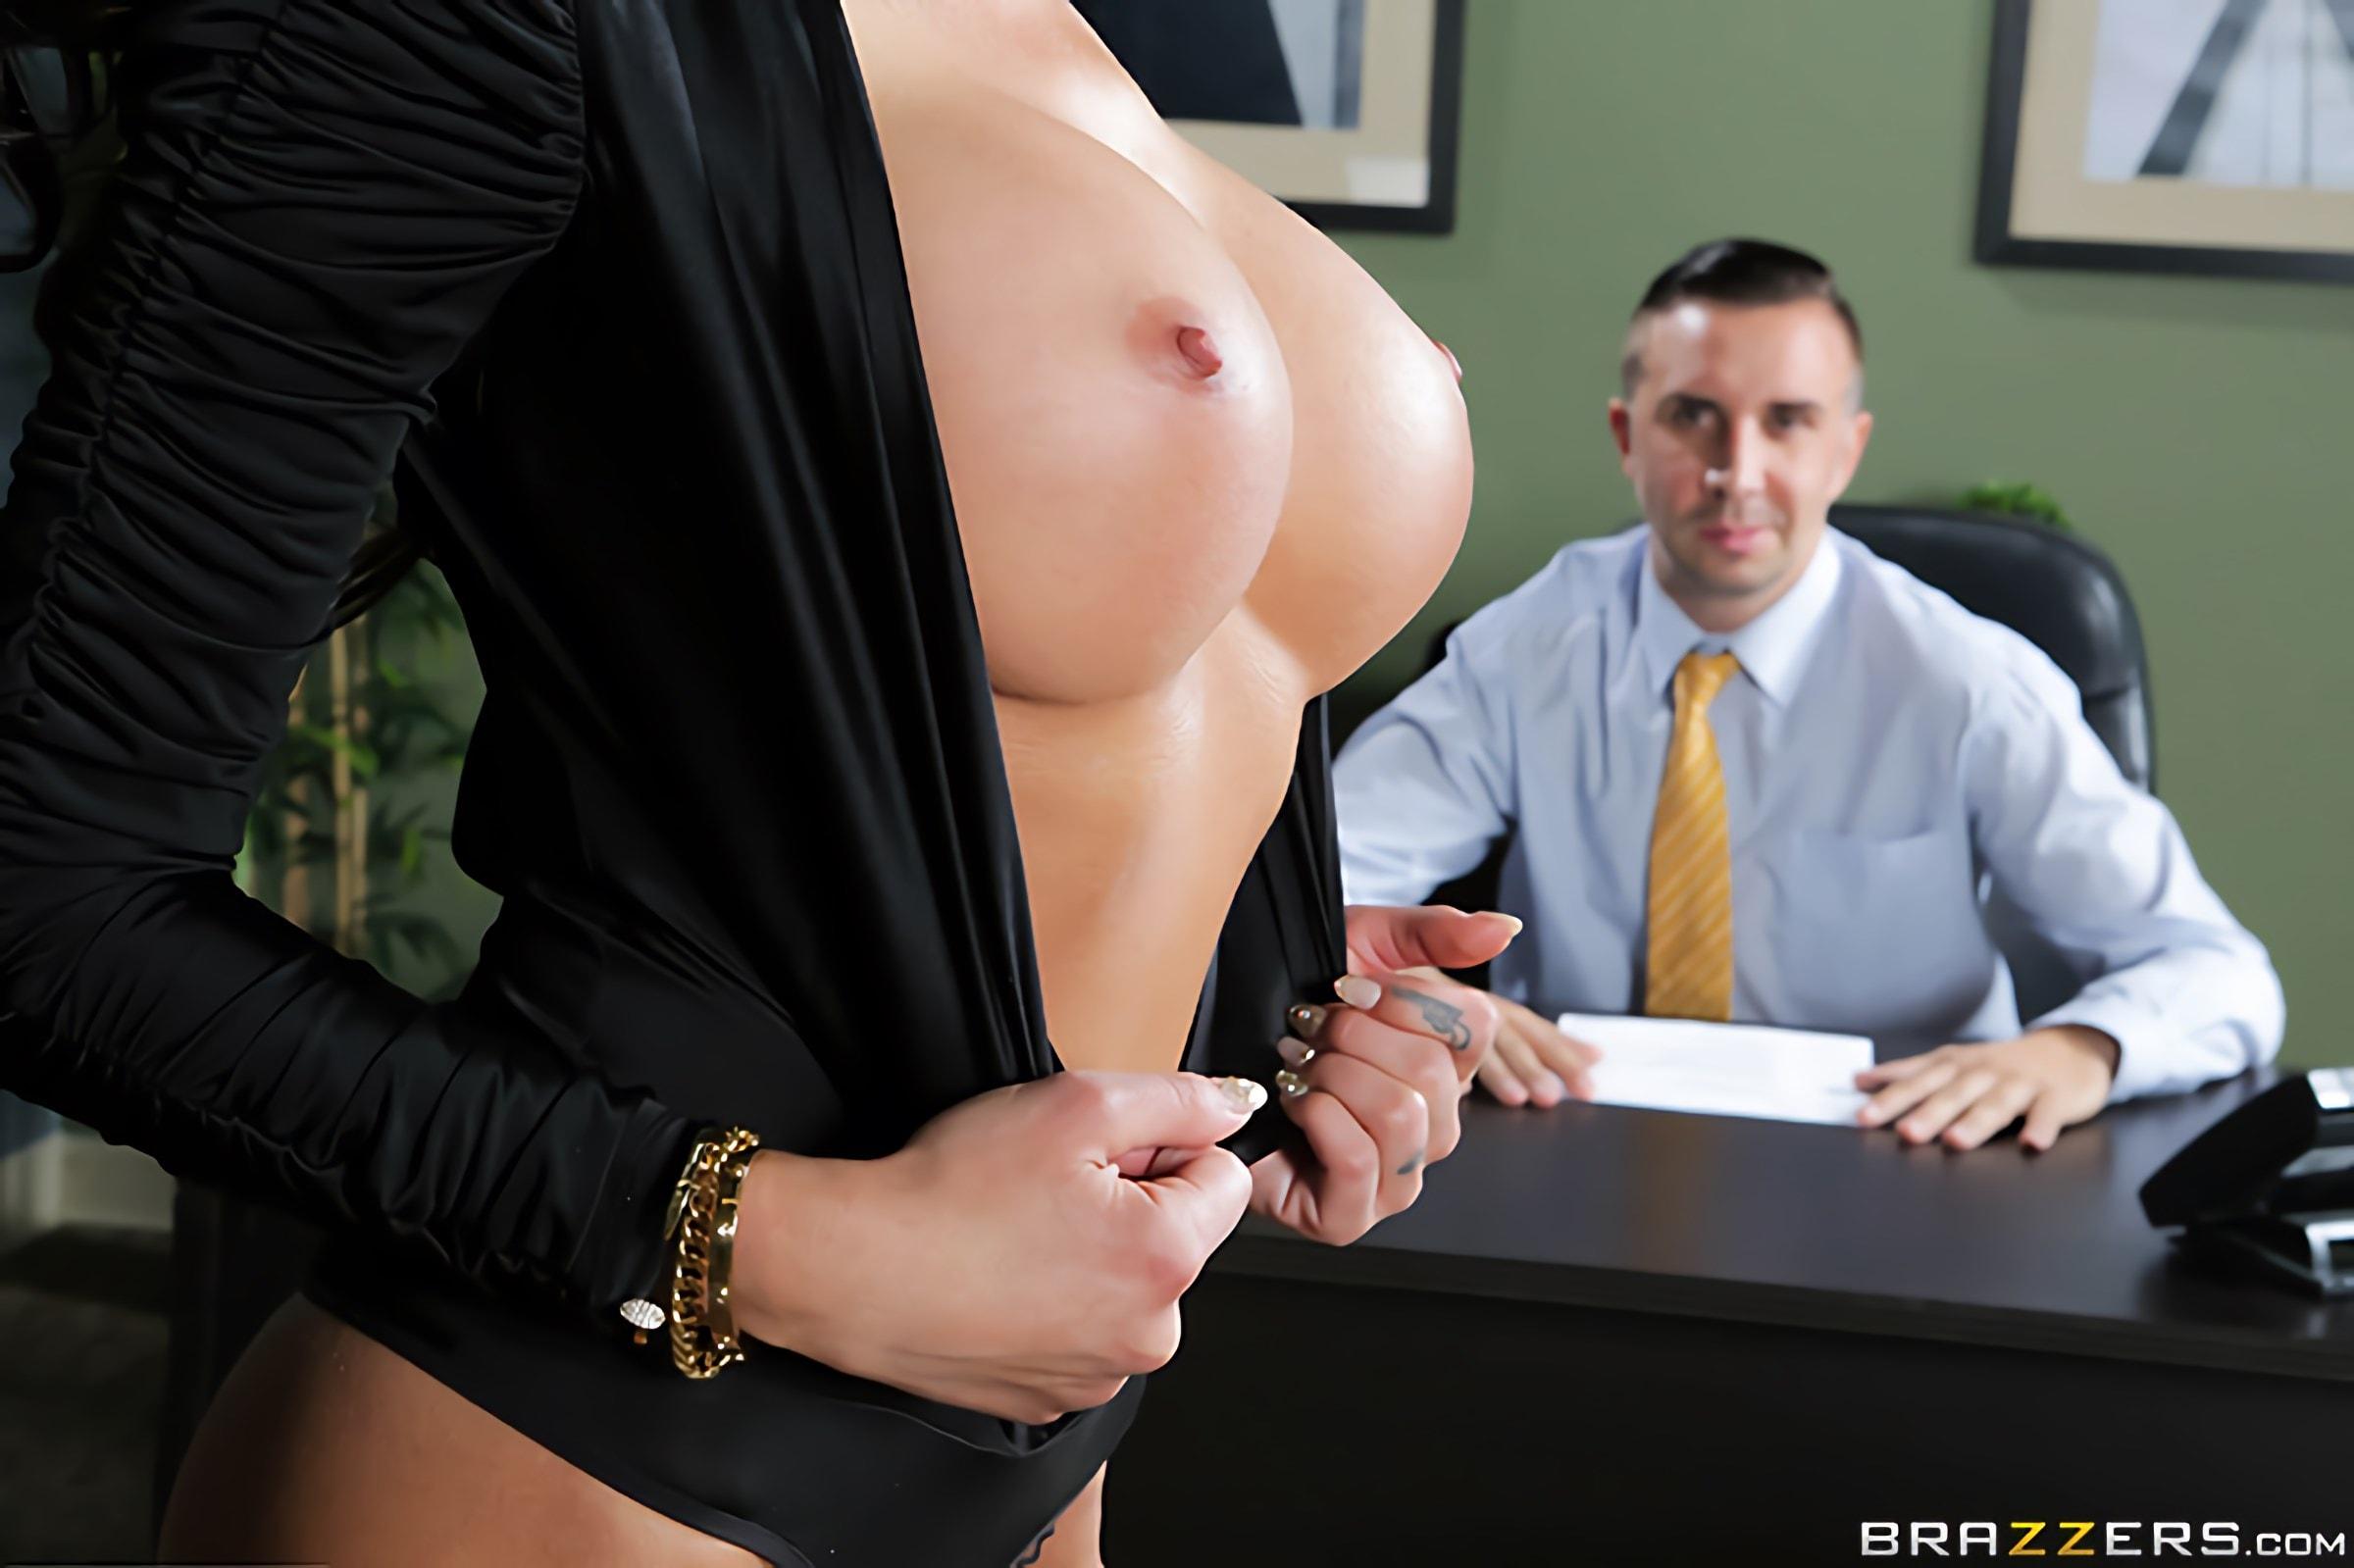 Big tits free porn photo